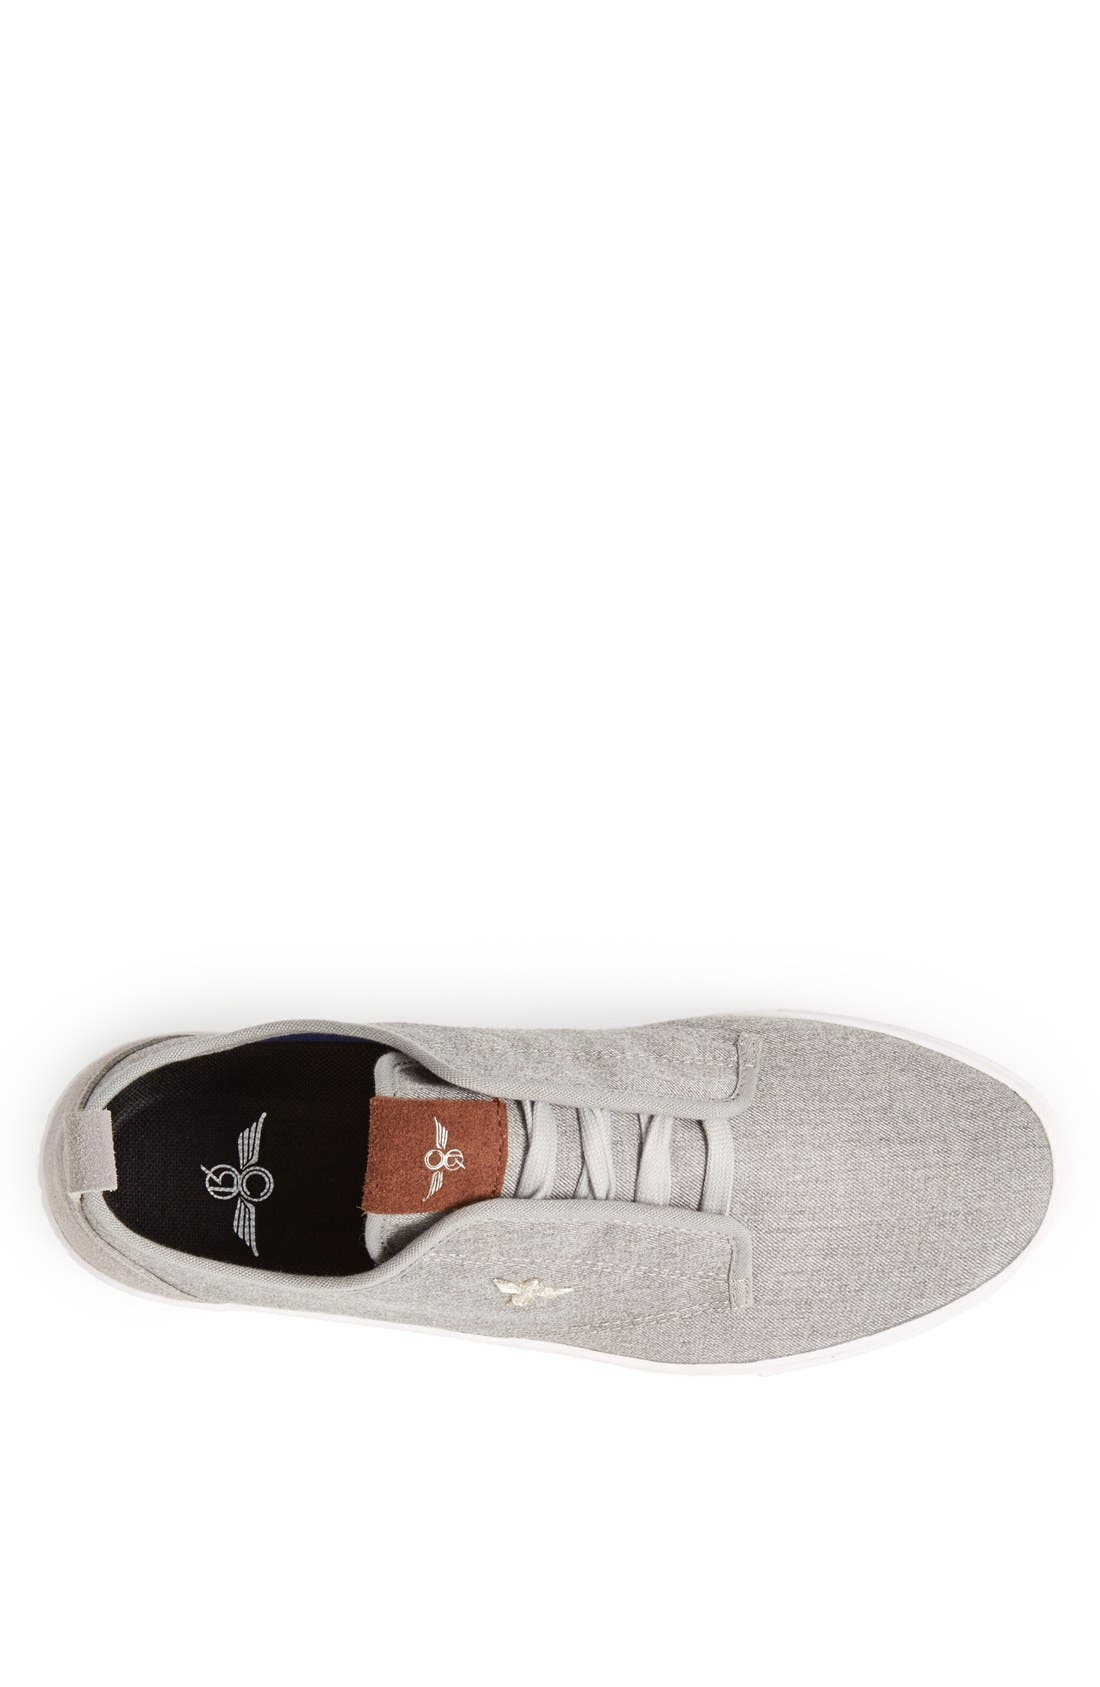 Alternate Image 3  - Creative Recreation 'Lacava' Sneaker (Men)